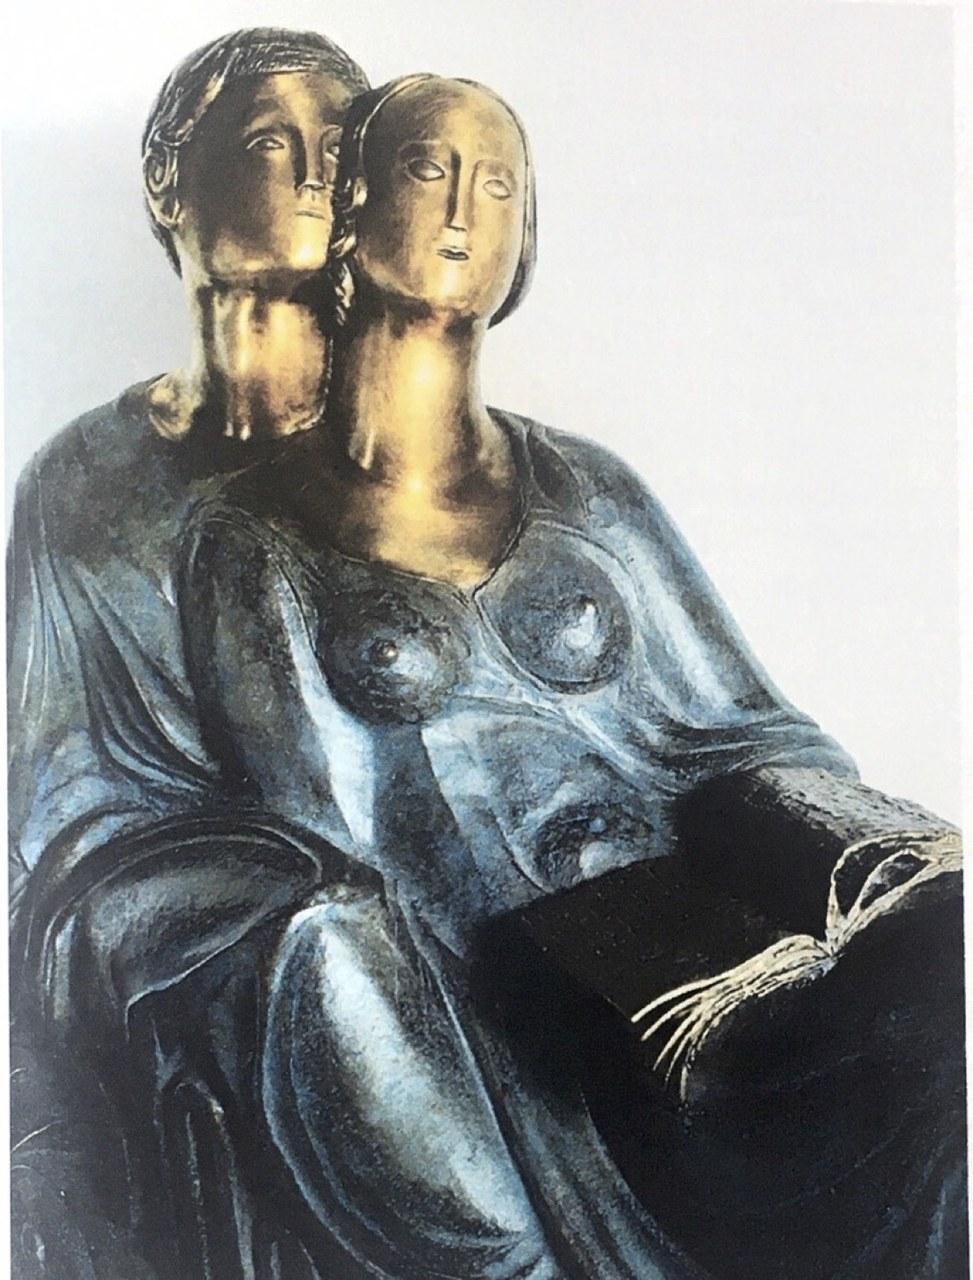 fig. 7 Alba Gonzales,Paolo e Francesca, 1993